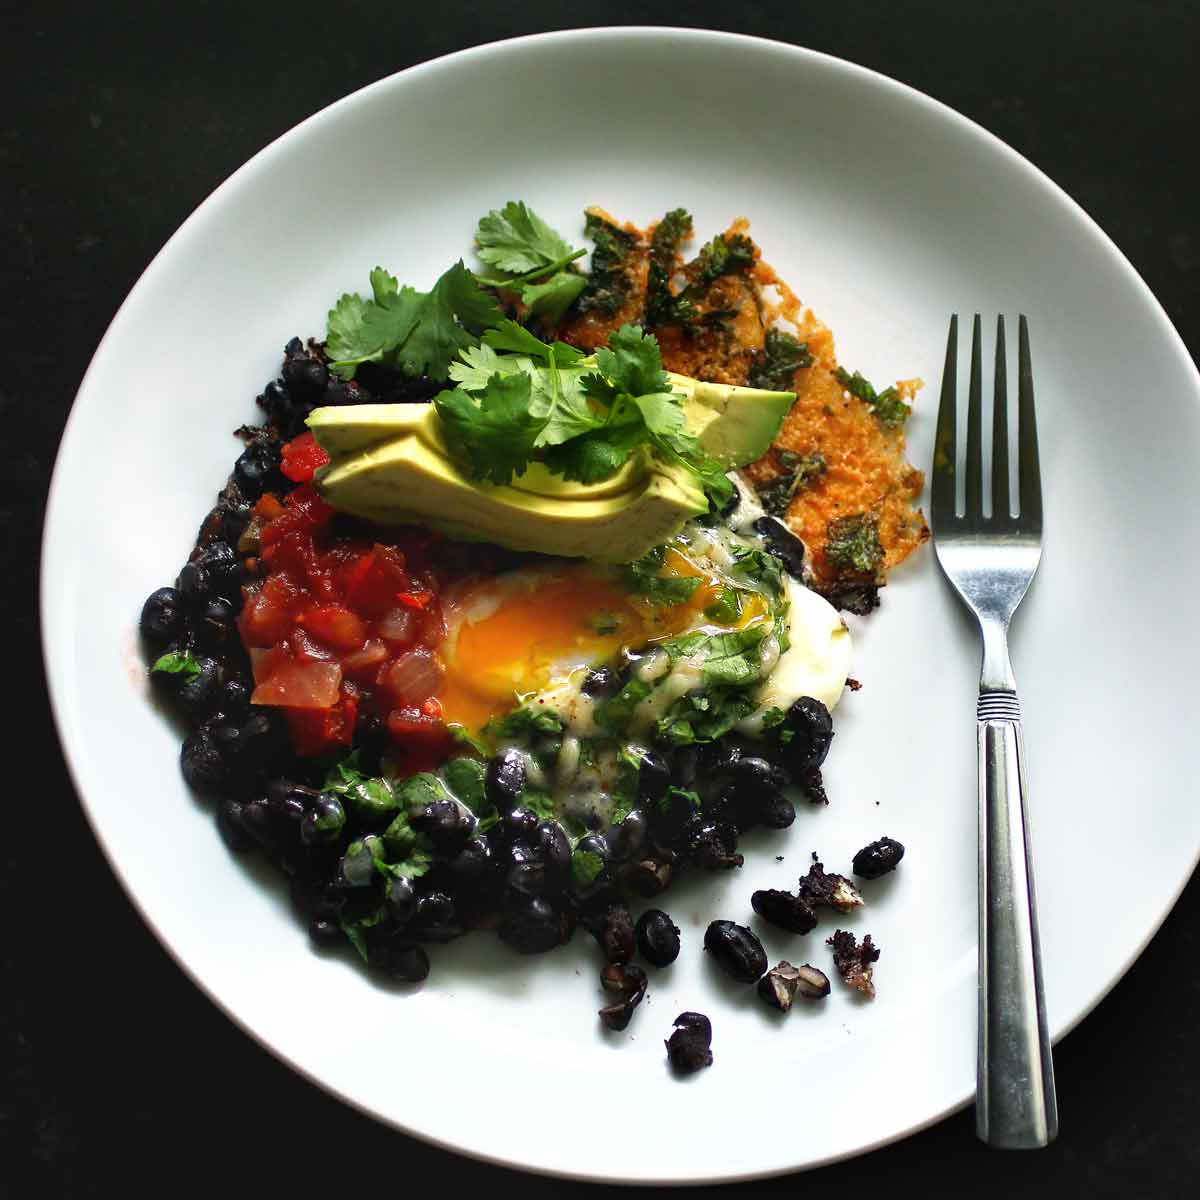 Crispy Cheesy Black Bean Breakfast (or lunch, or dinner)